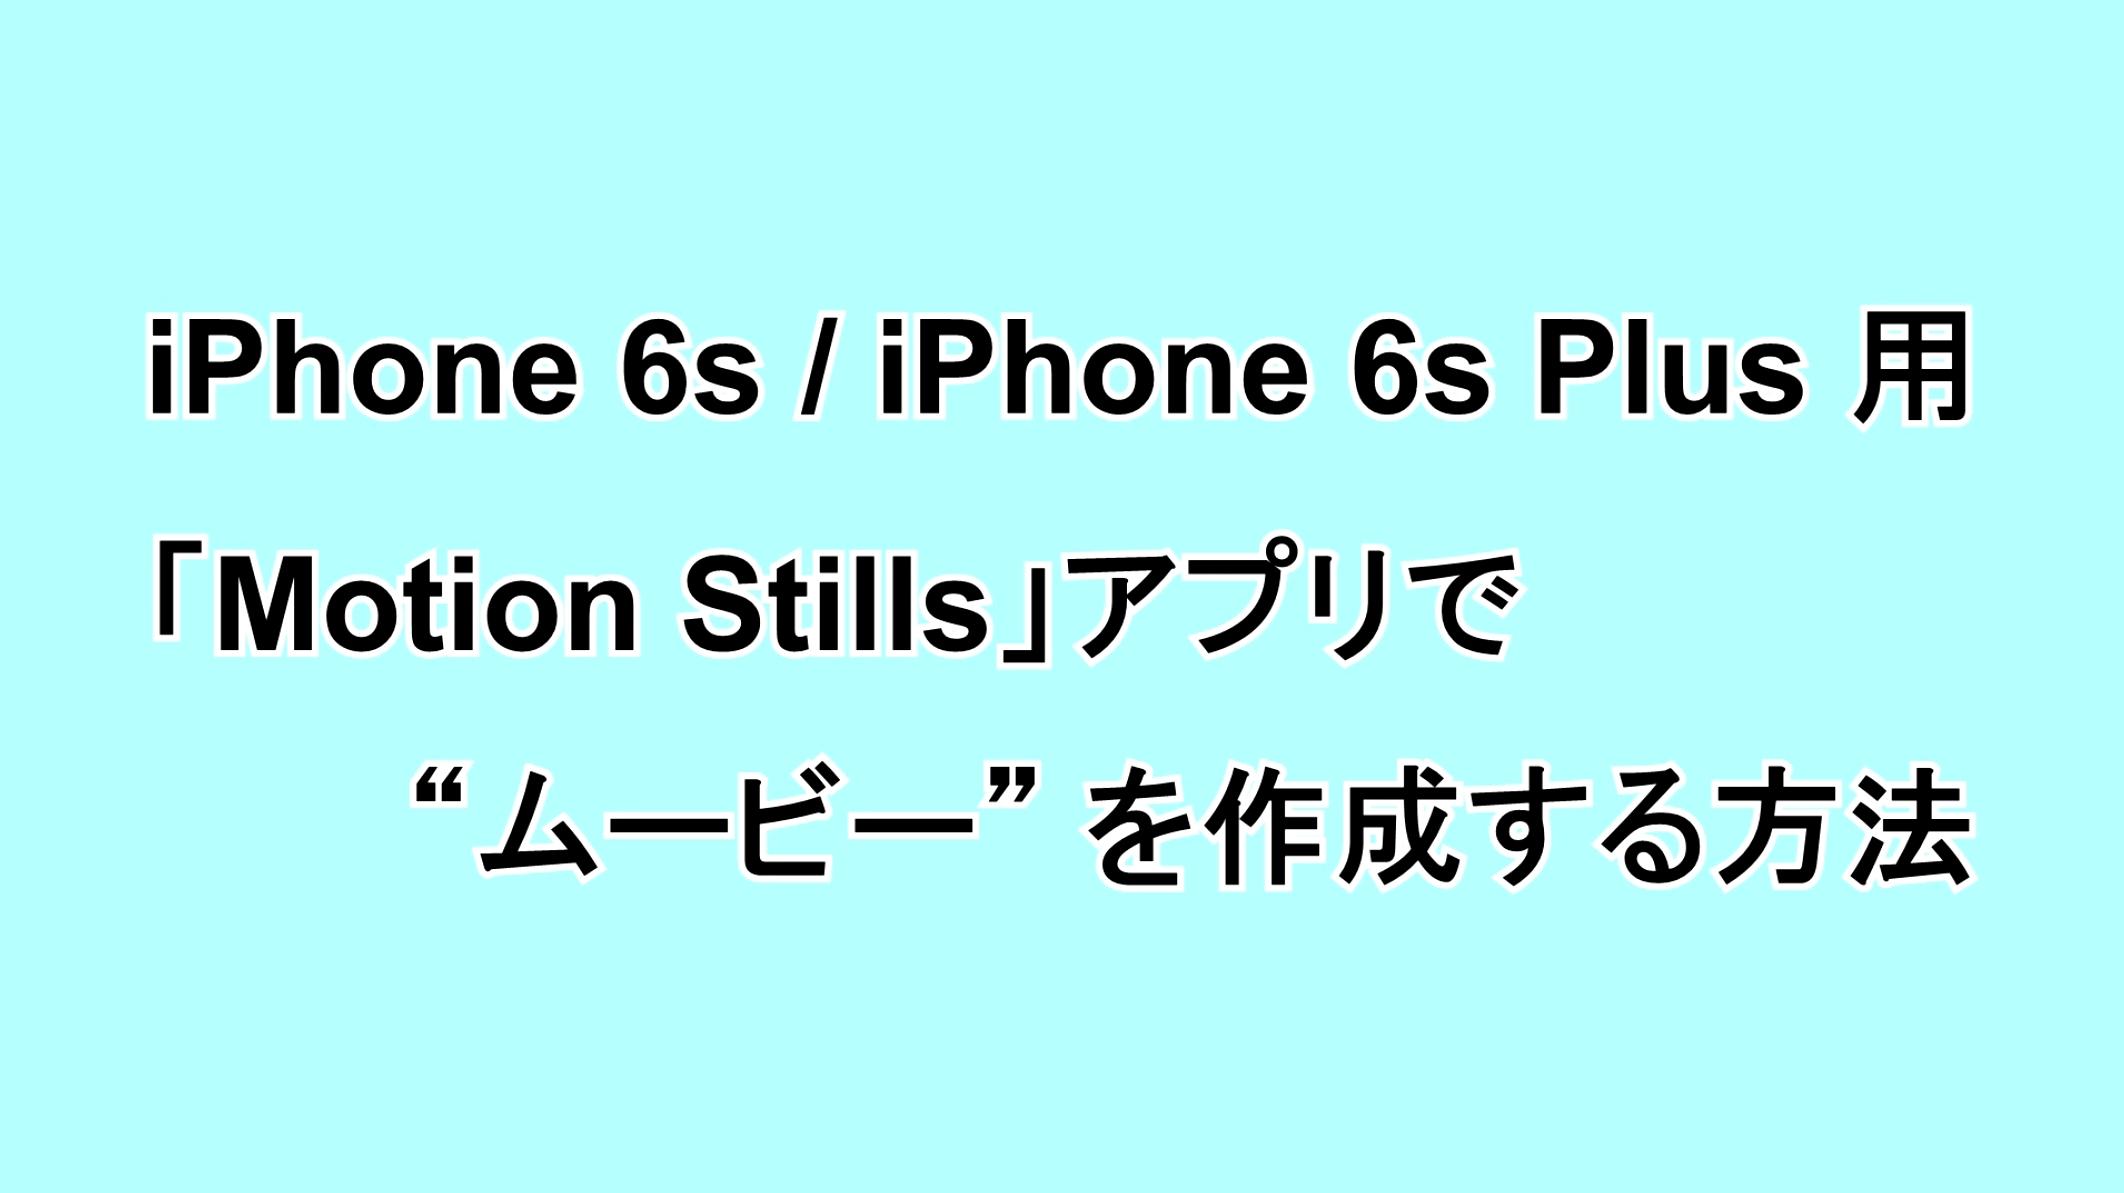 "iPhone 6s/6s Plus用 「Motion Stills」アプリで""ムービー""を作成する方法"